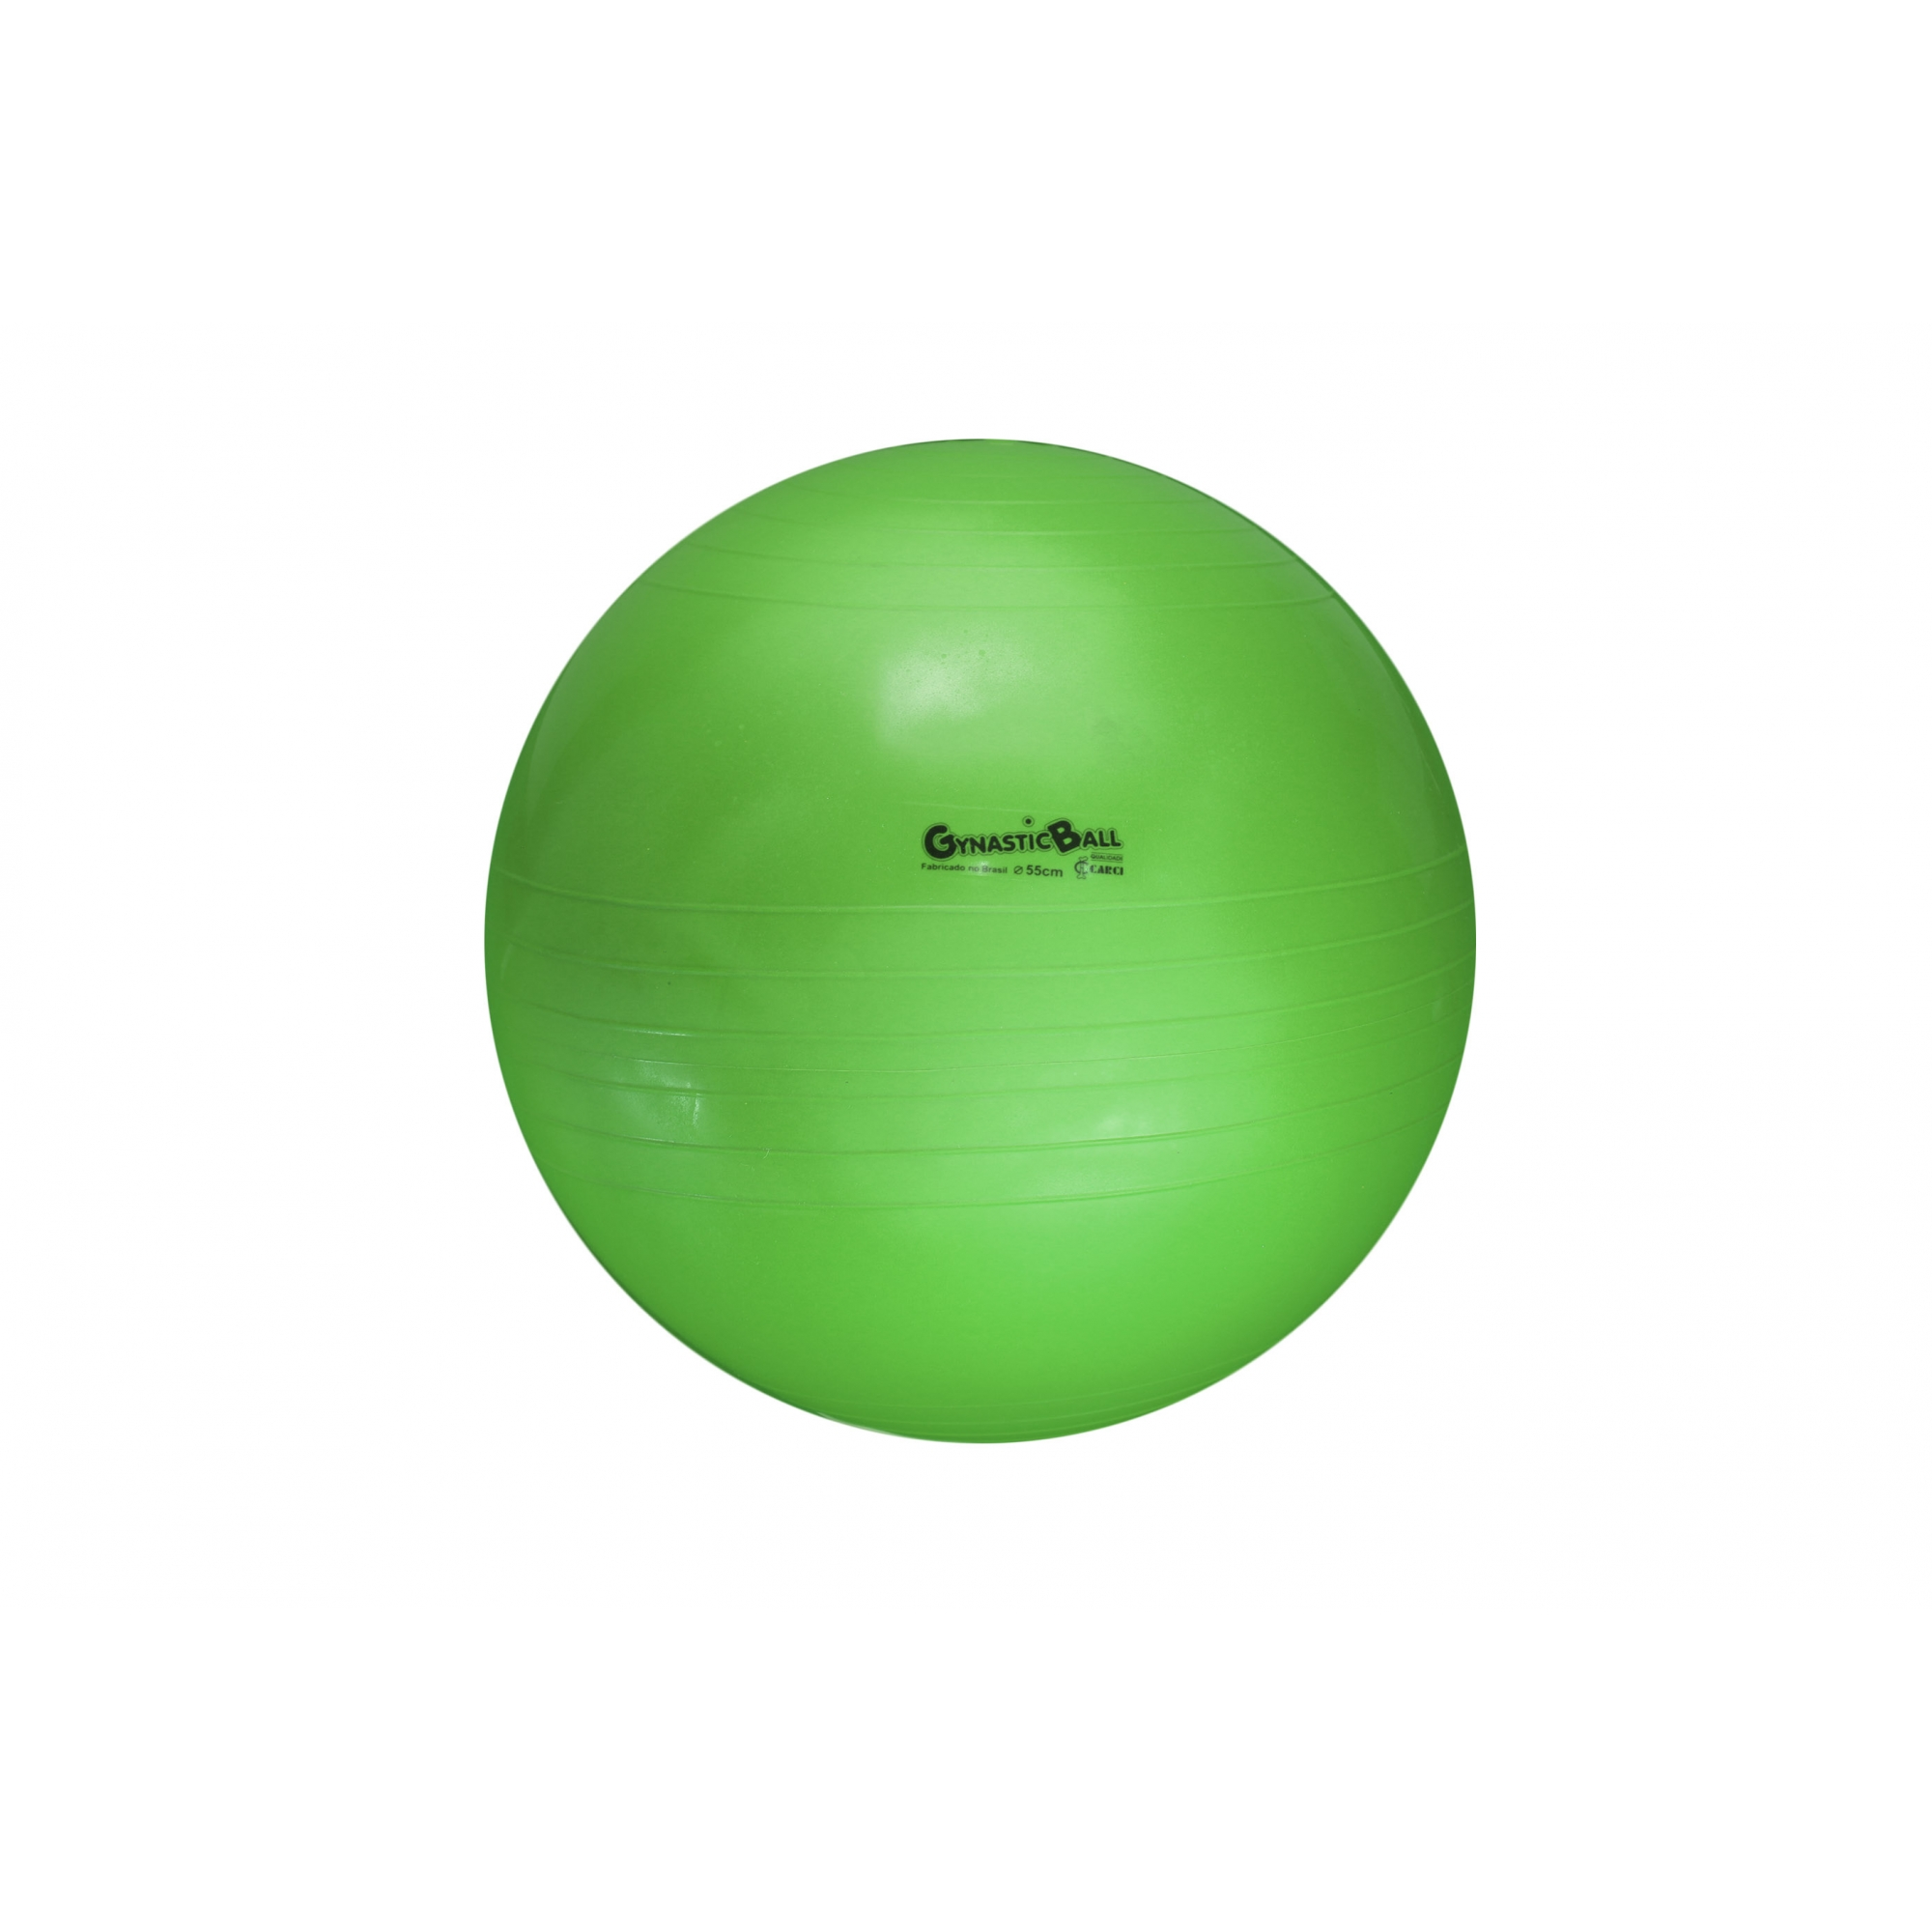 Bola suíça para pilates 55cm Gynastic Ball - Verde - BL.01.55.VD